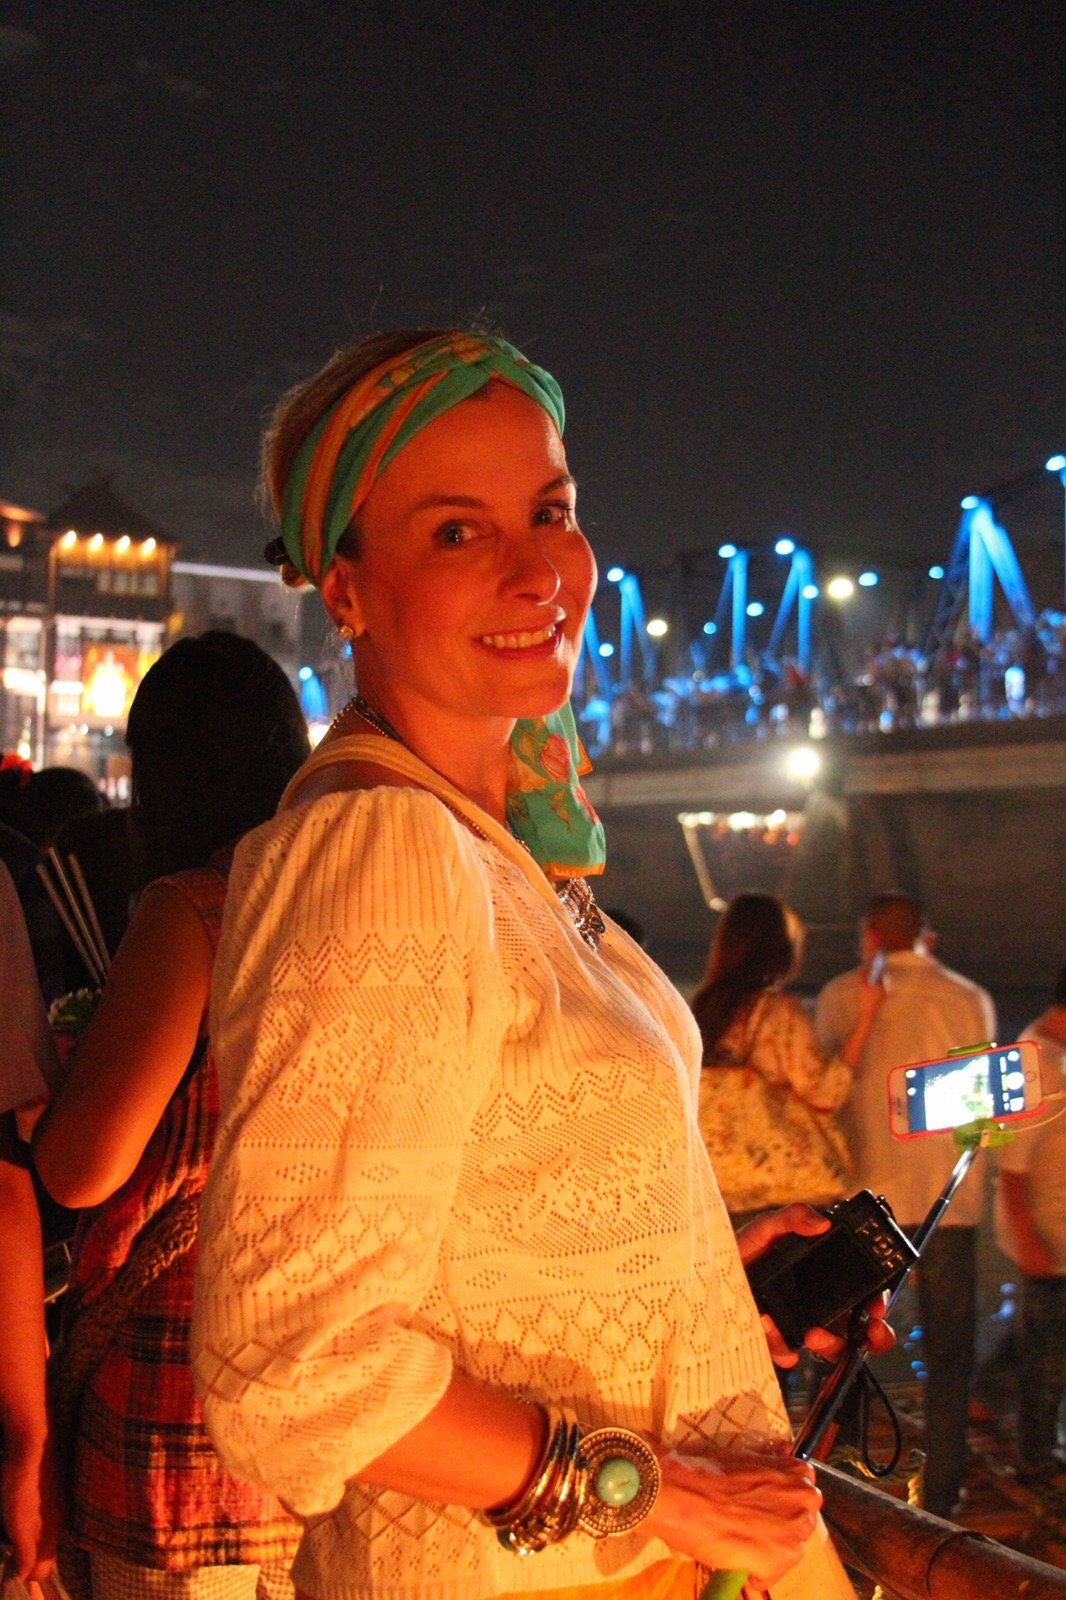 Loi_Krathong_Tailândia_Festival_Chiang_Mai_29